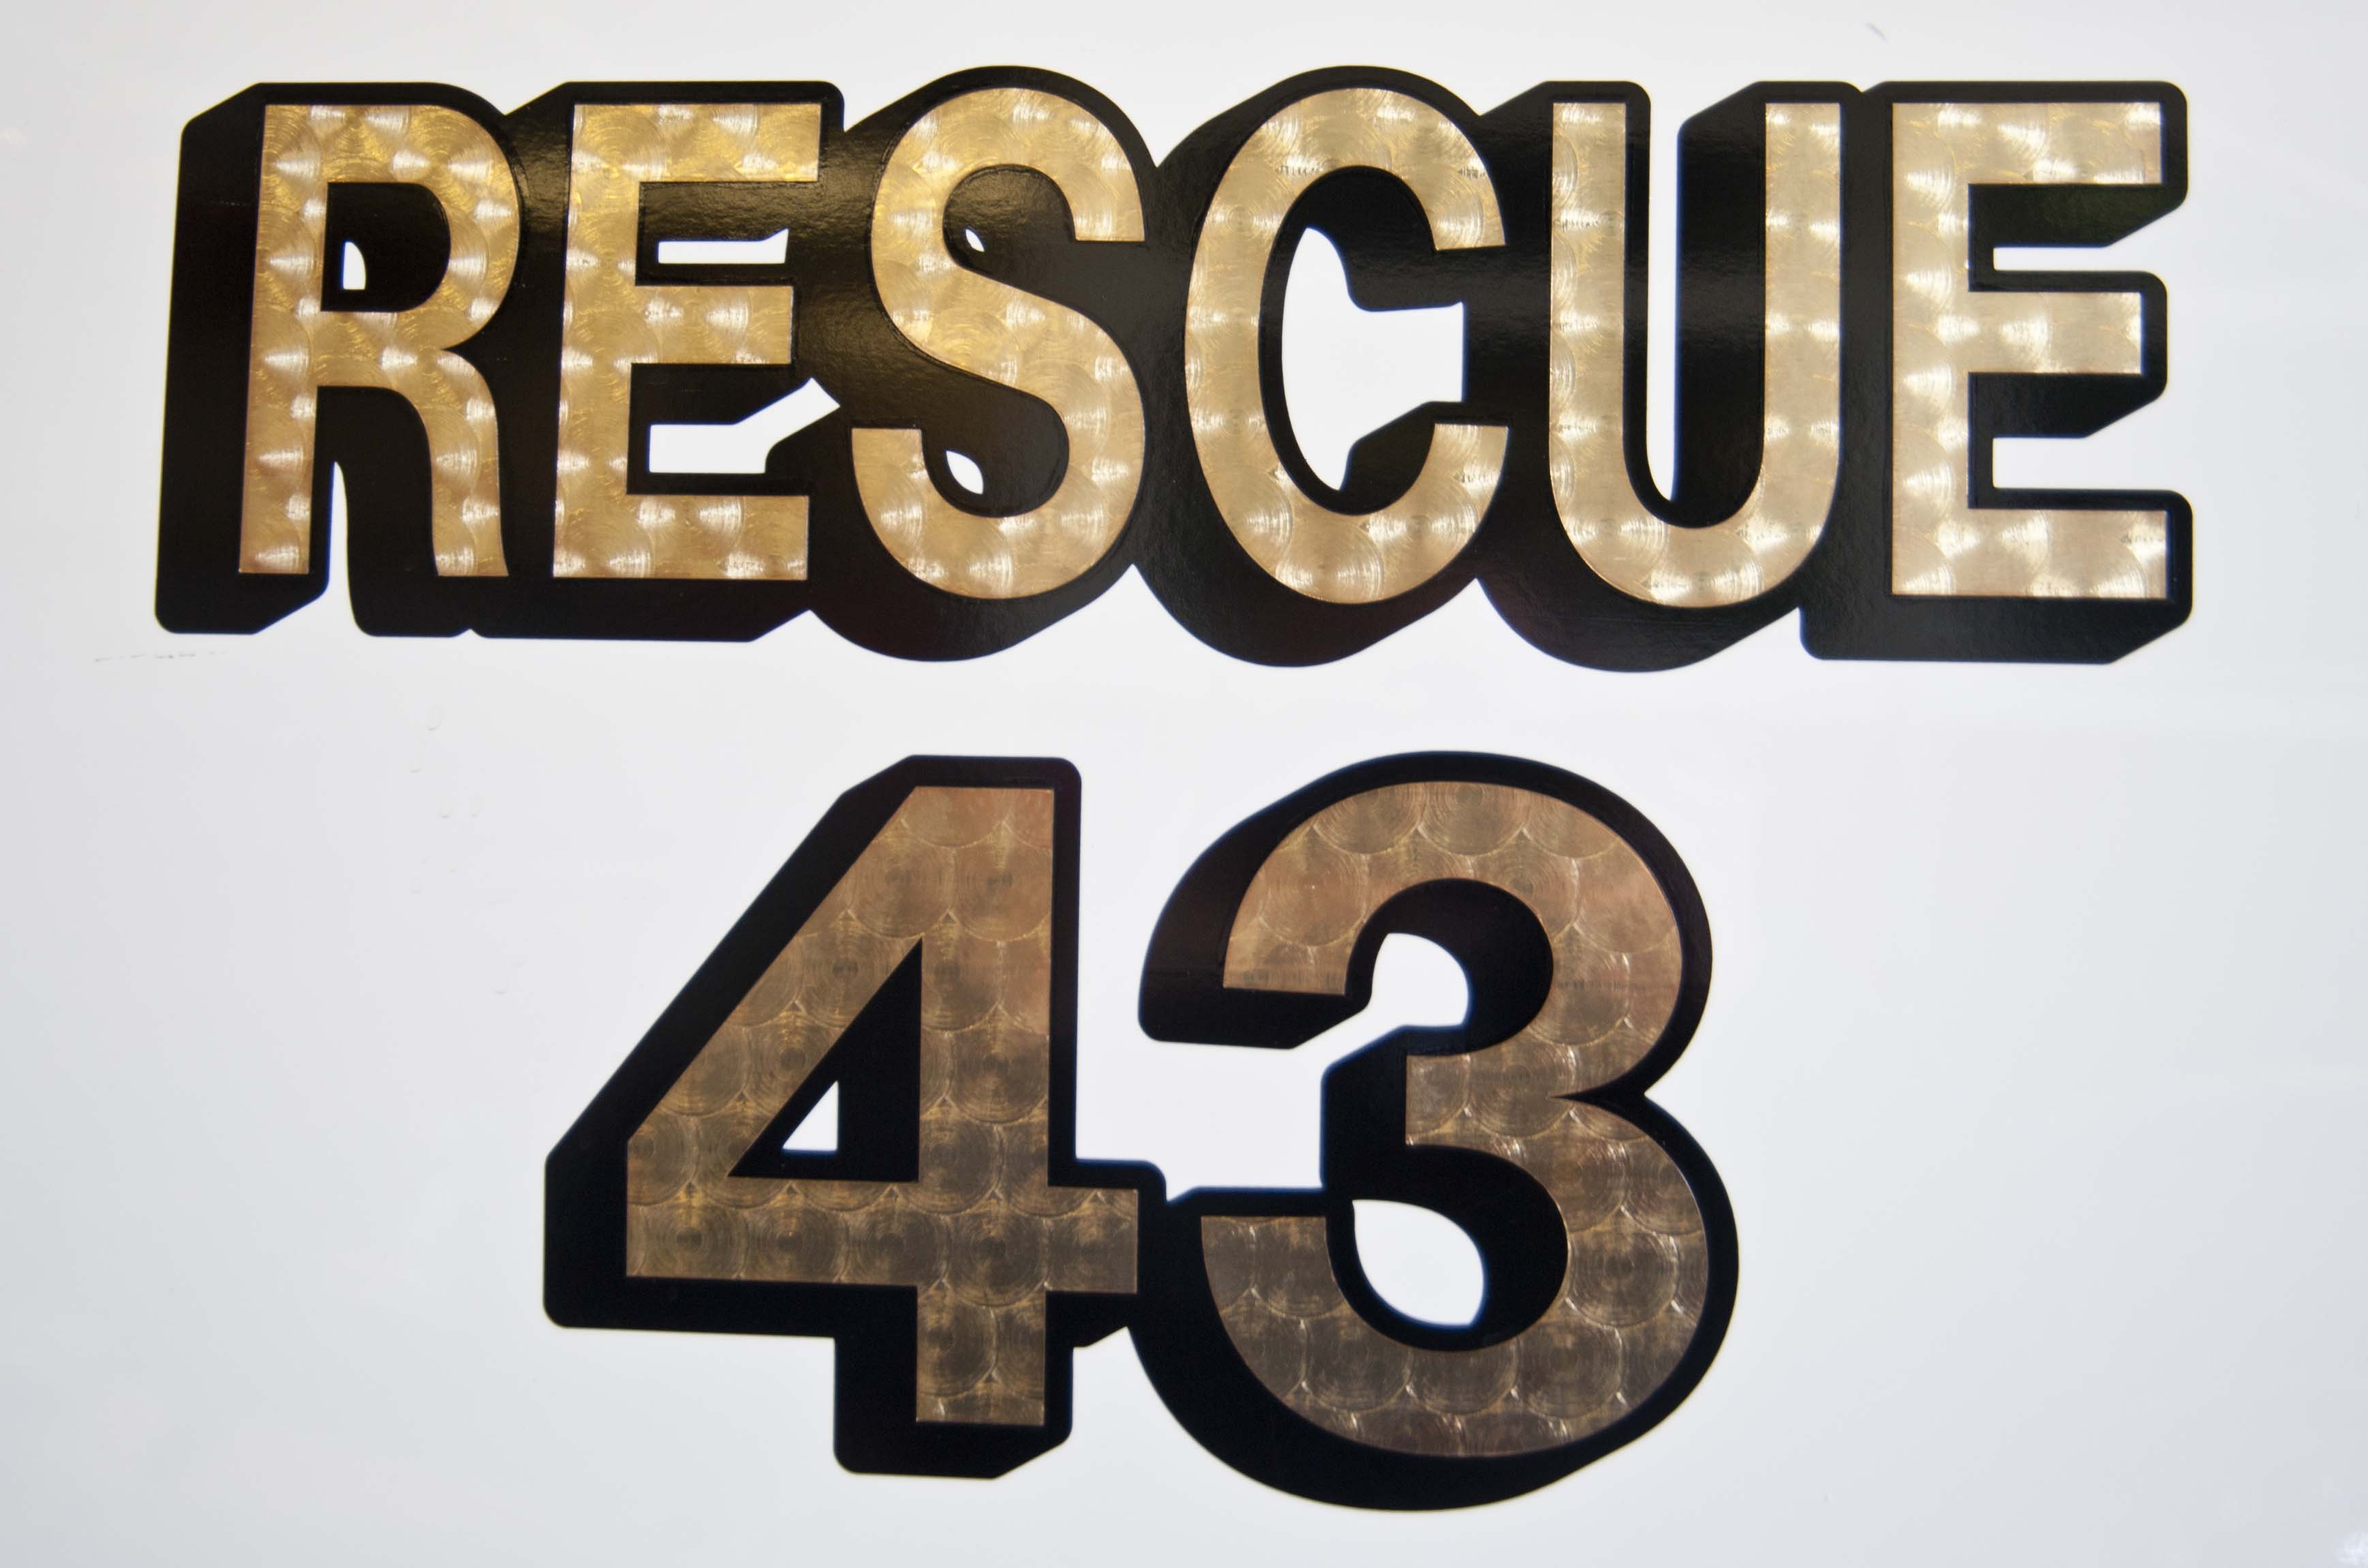 Rescue 43 Sign